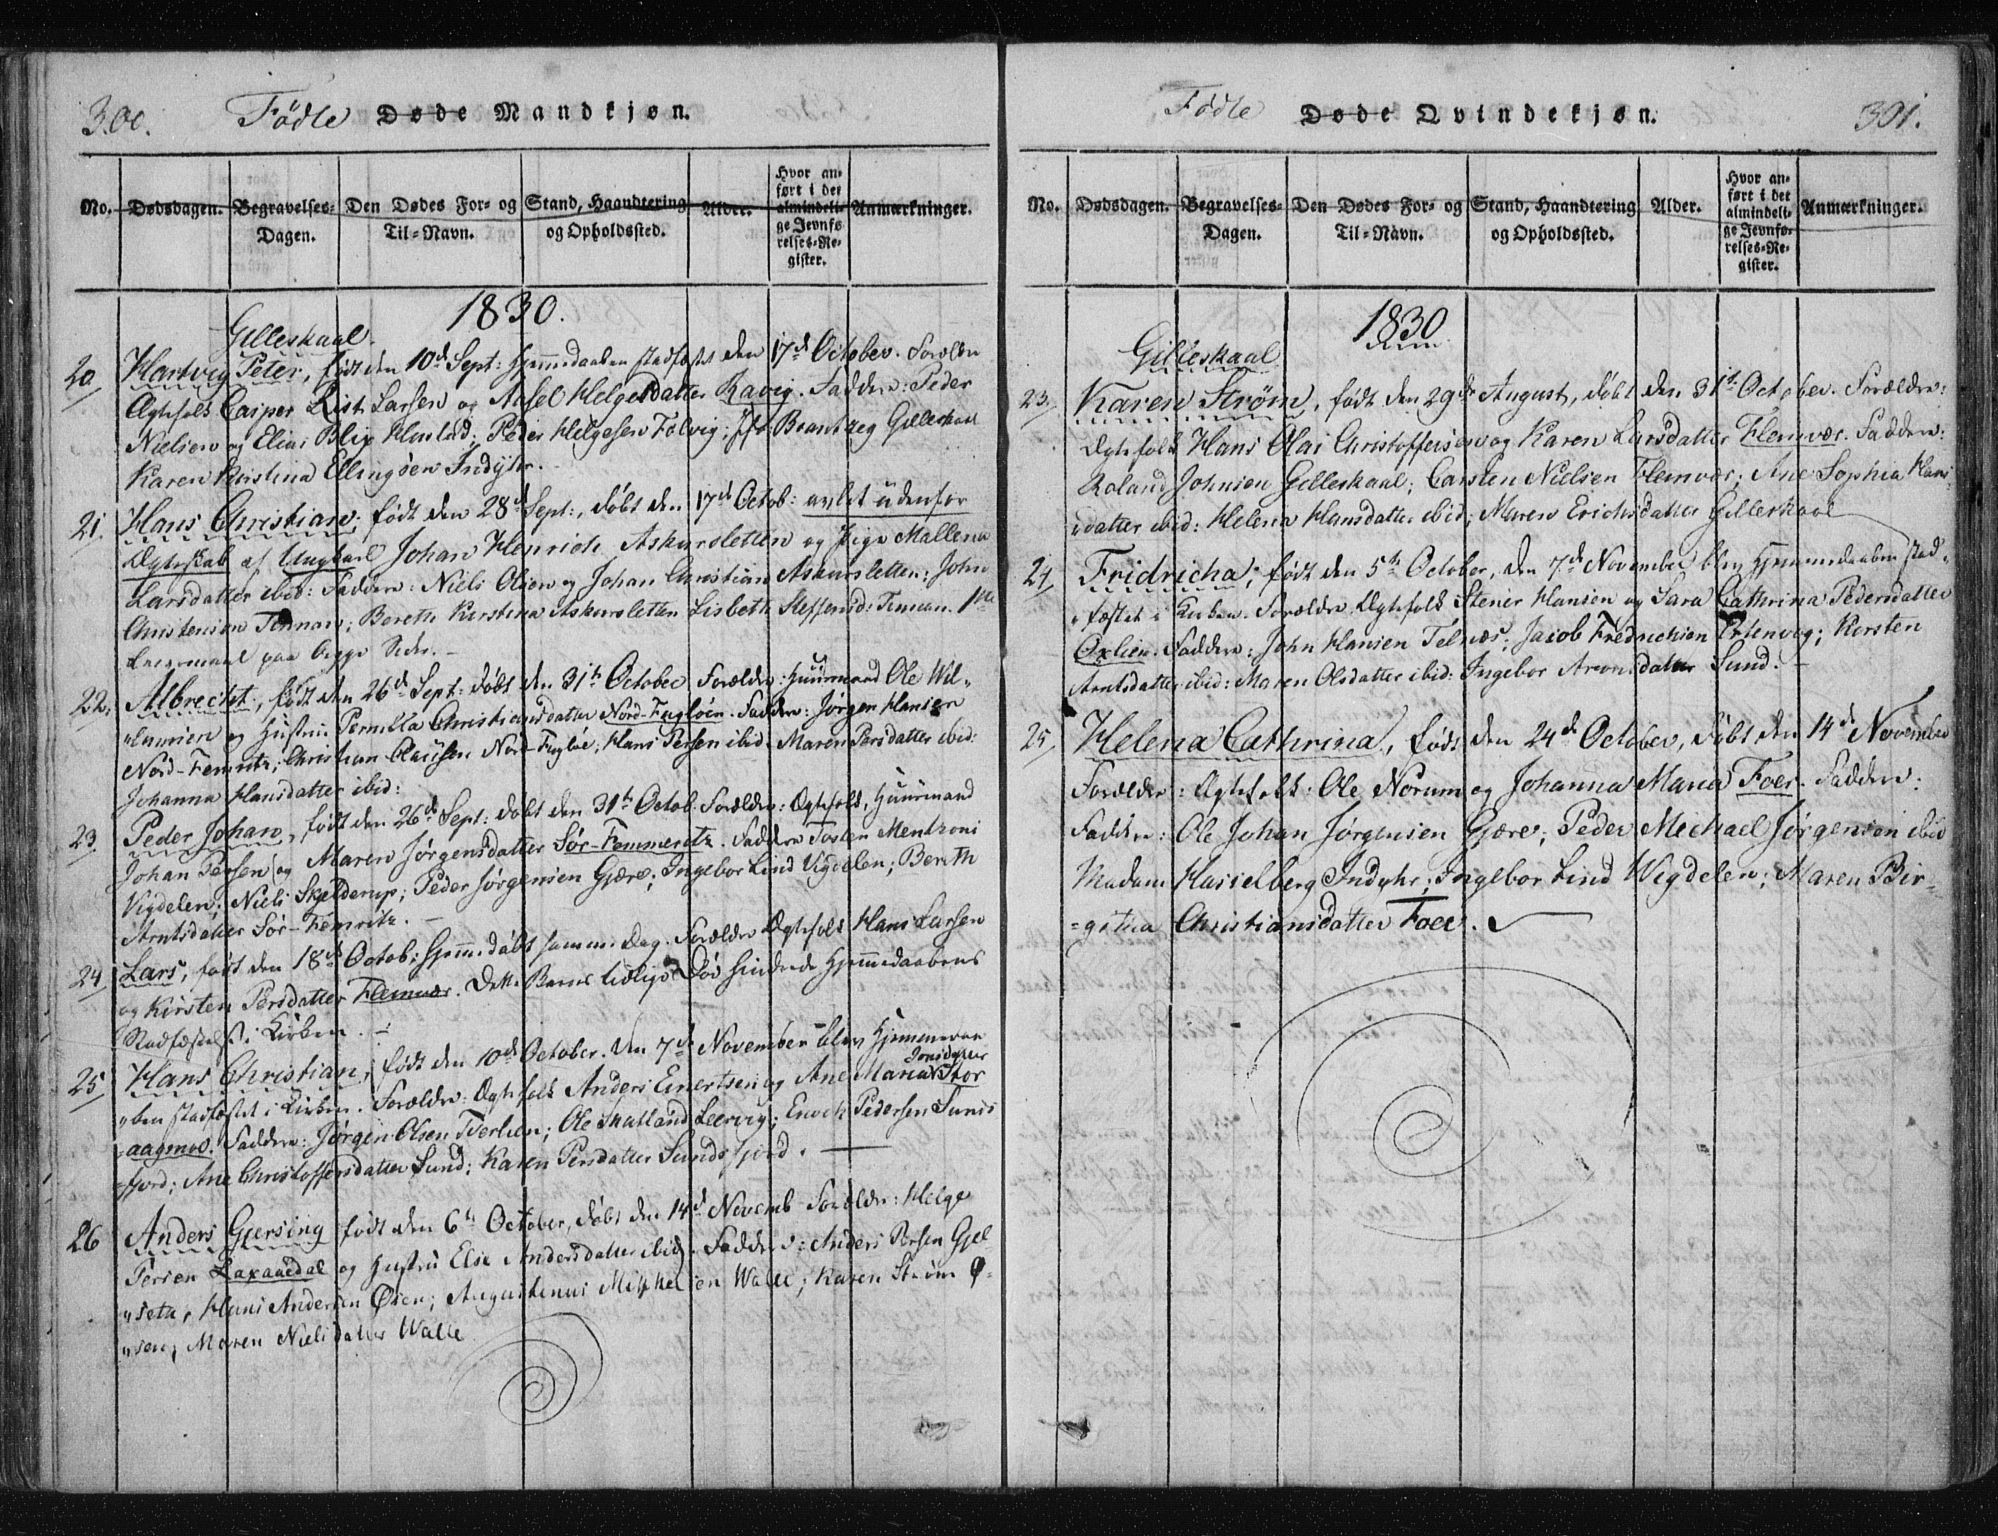 SAT, Ministerialprotokoller, klokkerbøker og fødselsregistre - Nordland, 805/L0096: Ministerialbok nr. 805A03, 1820-1837, s. 300-301